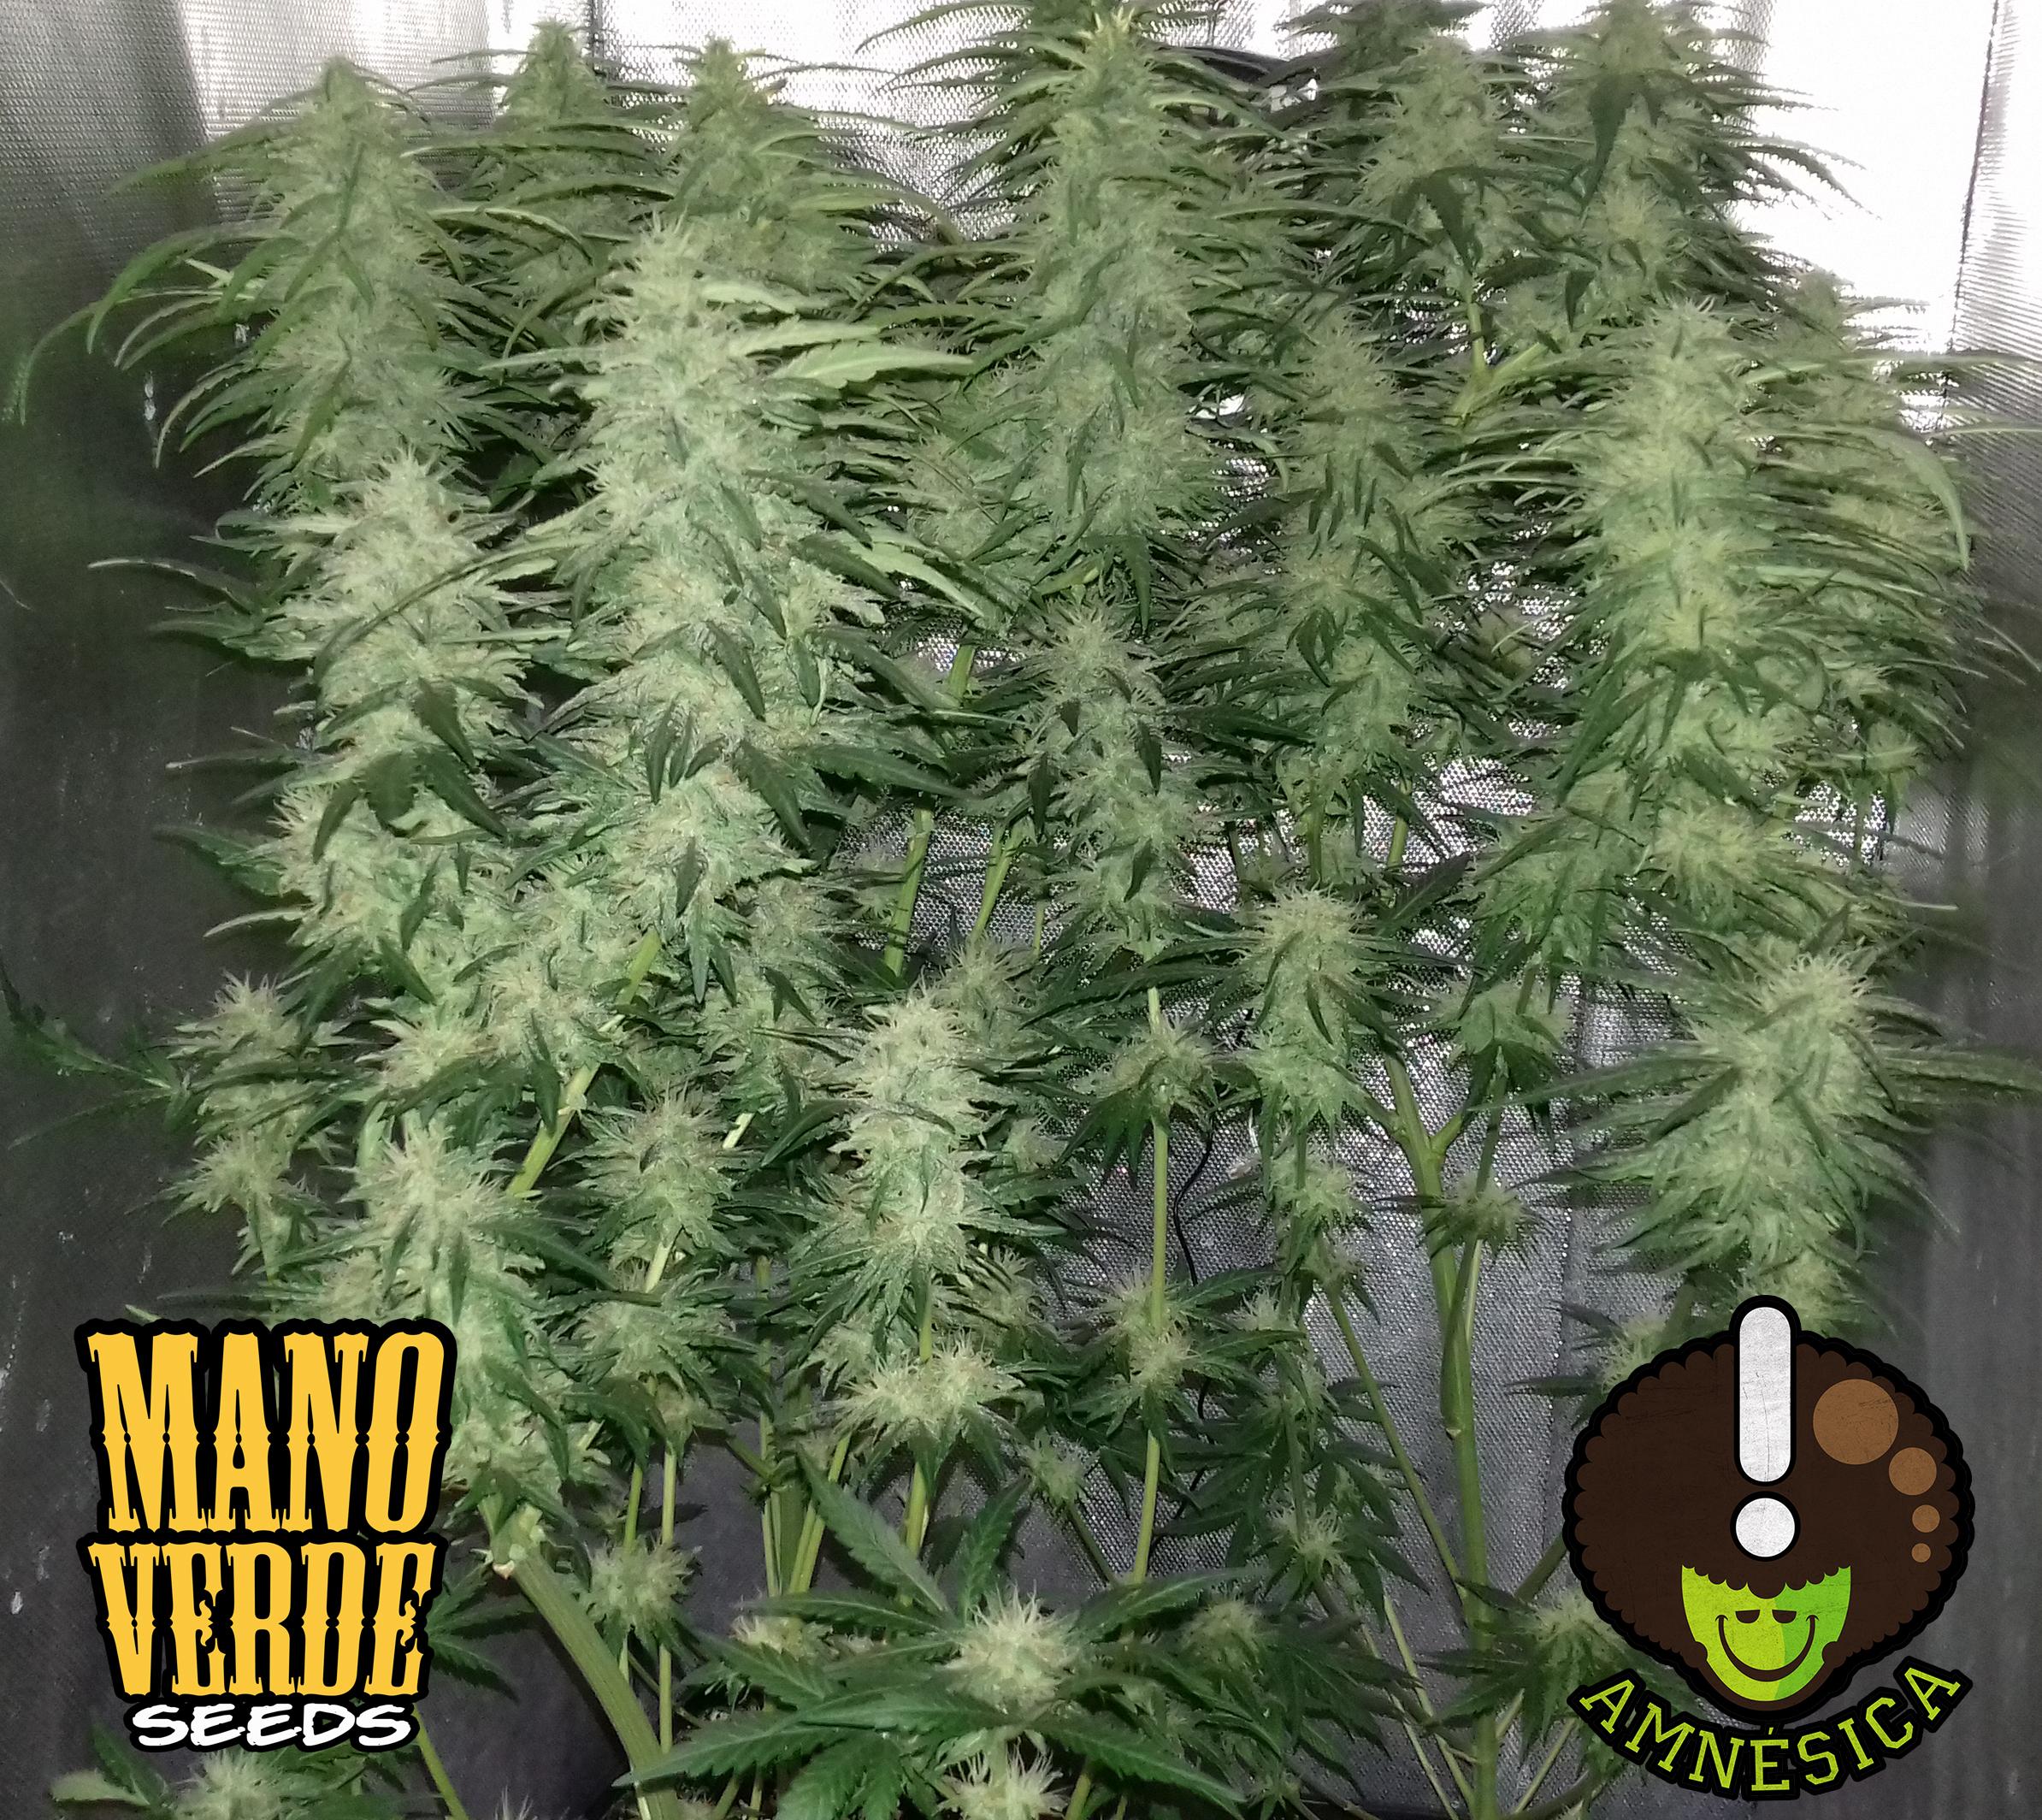 amnesica-manoverde-seeds-68c-59f-230